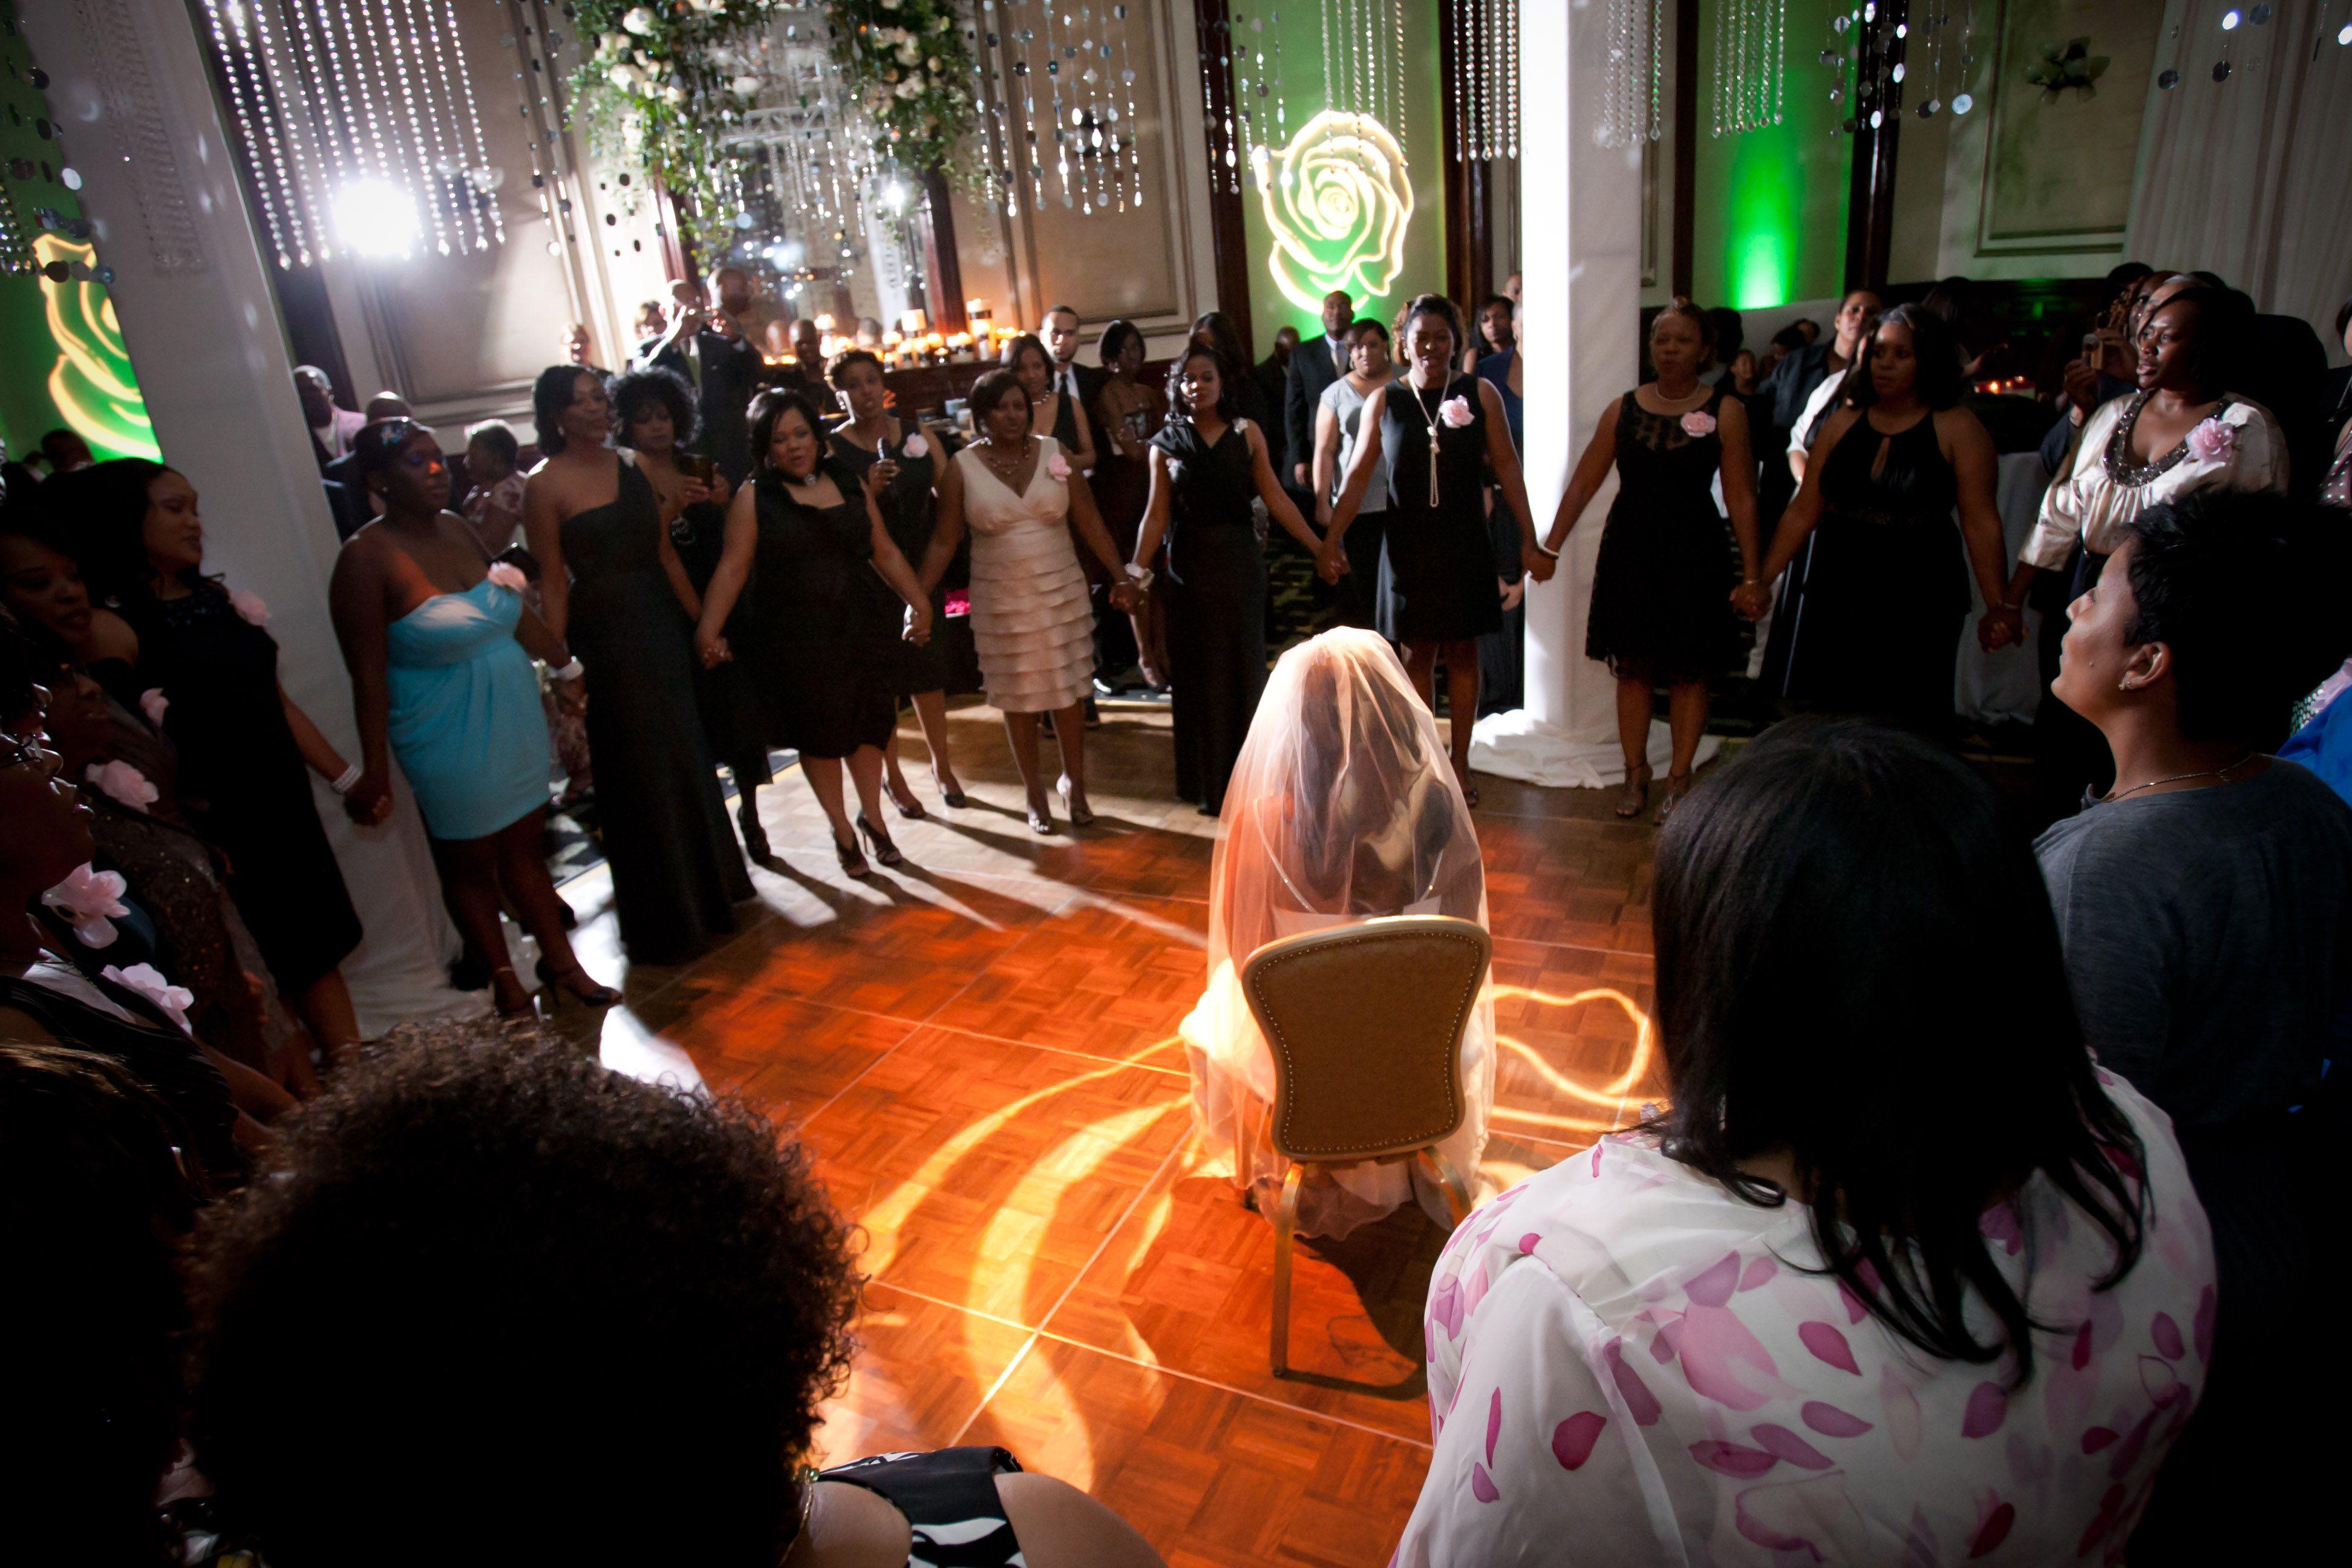 Aka sorority hymn at the wedding reception wedding bells